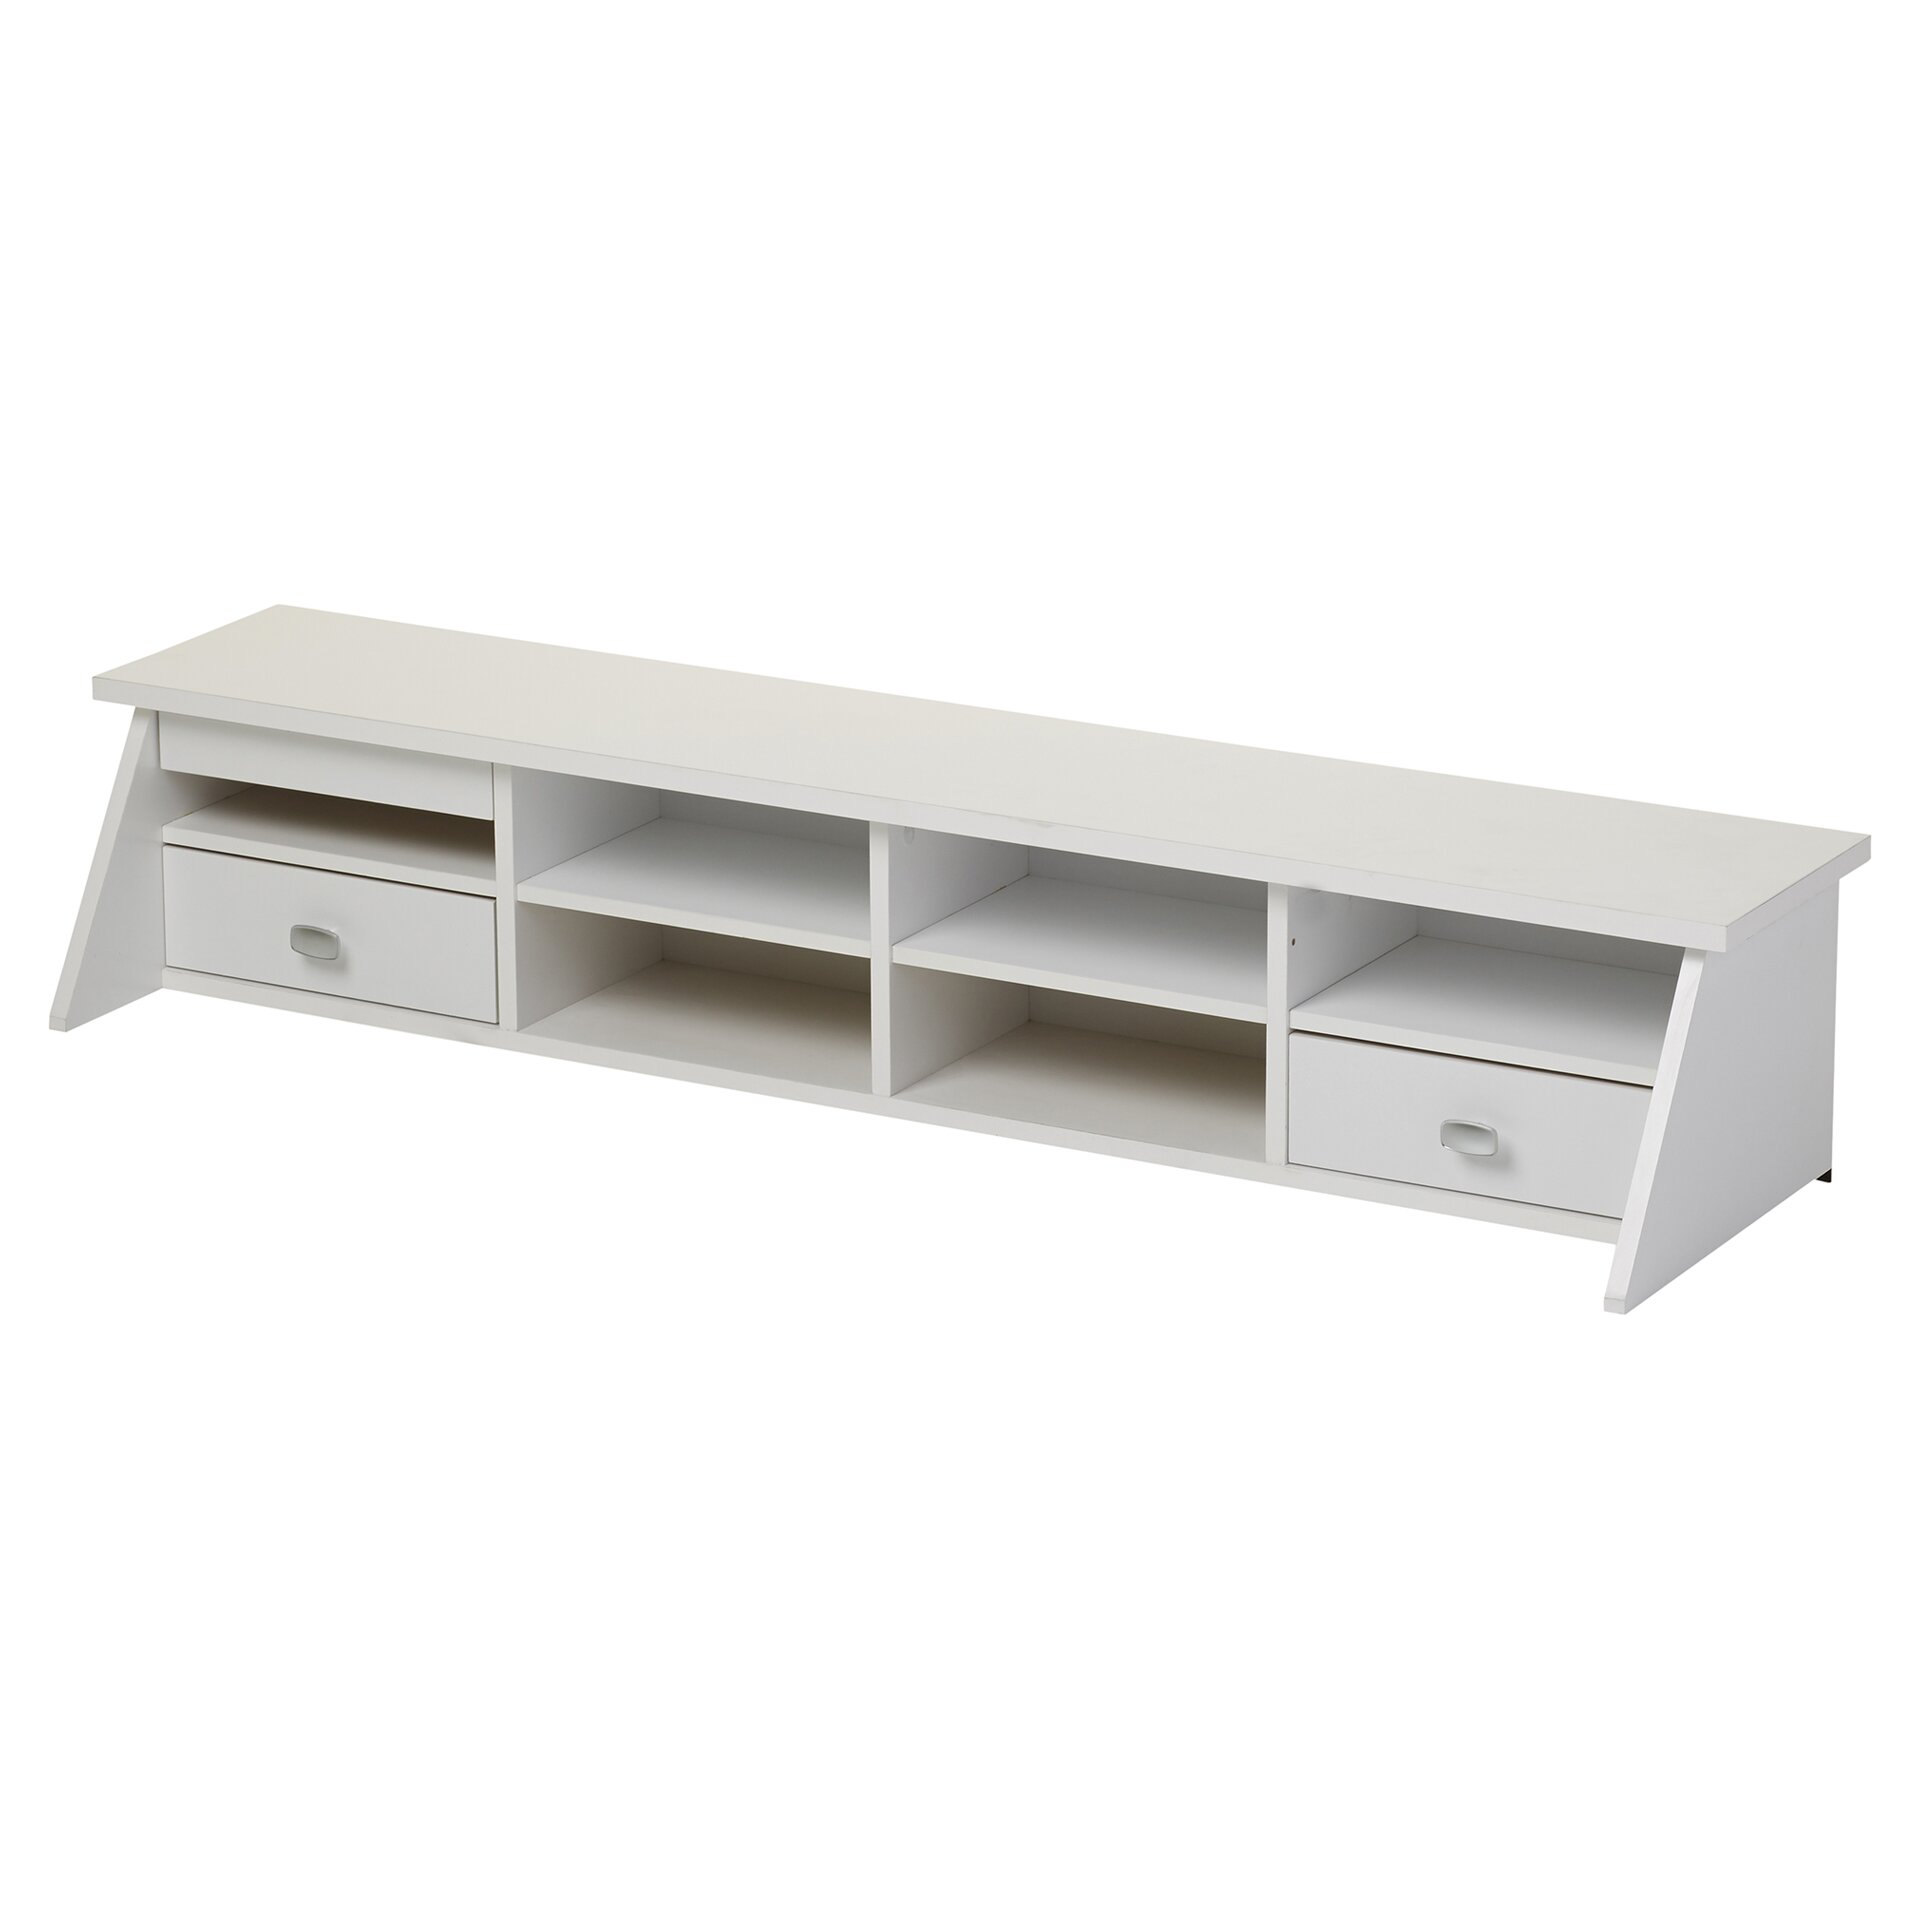 Furniture Office Furniture  All Desks Three Posts SKU: THRE2748